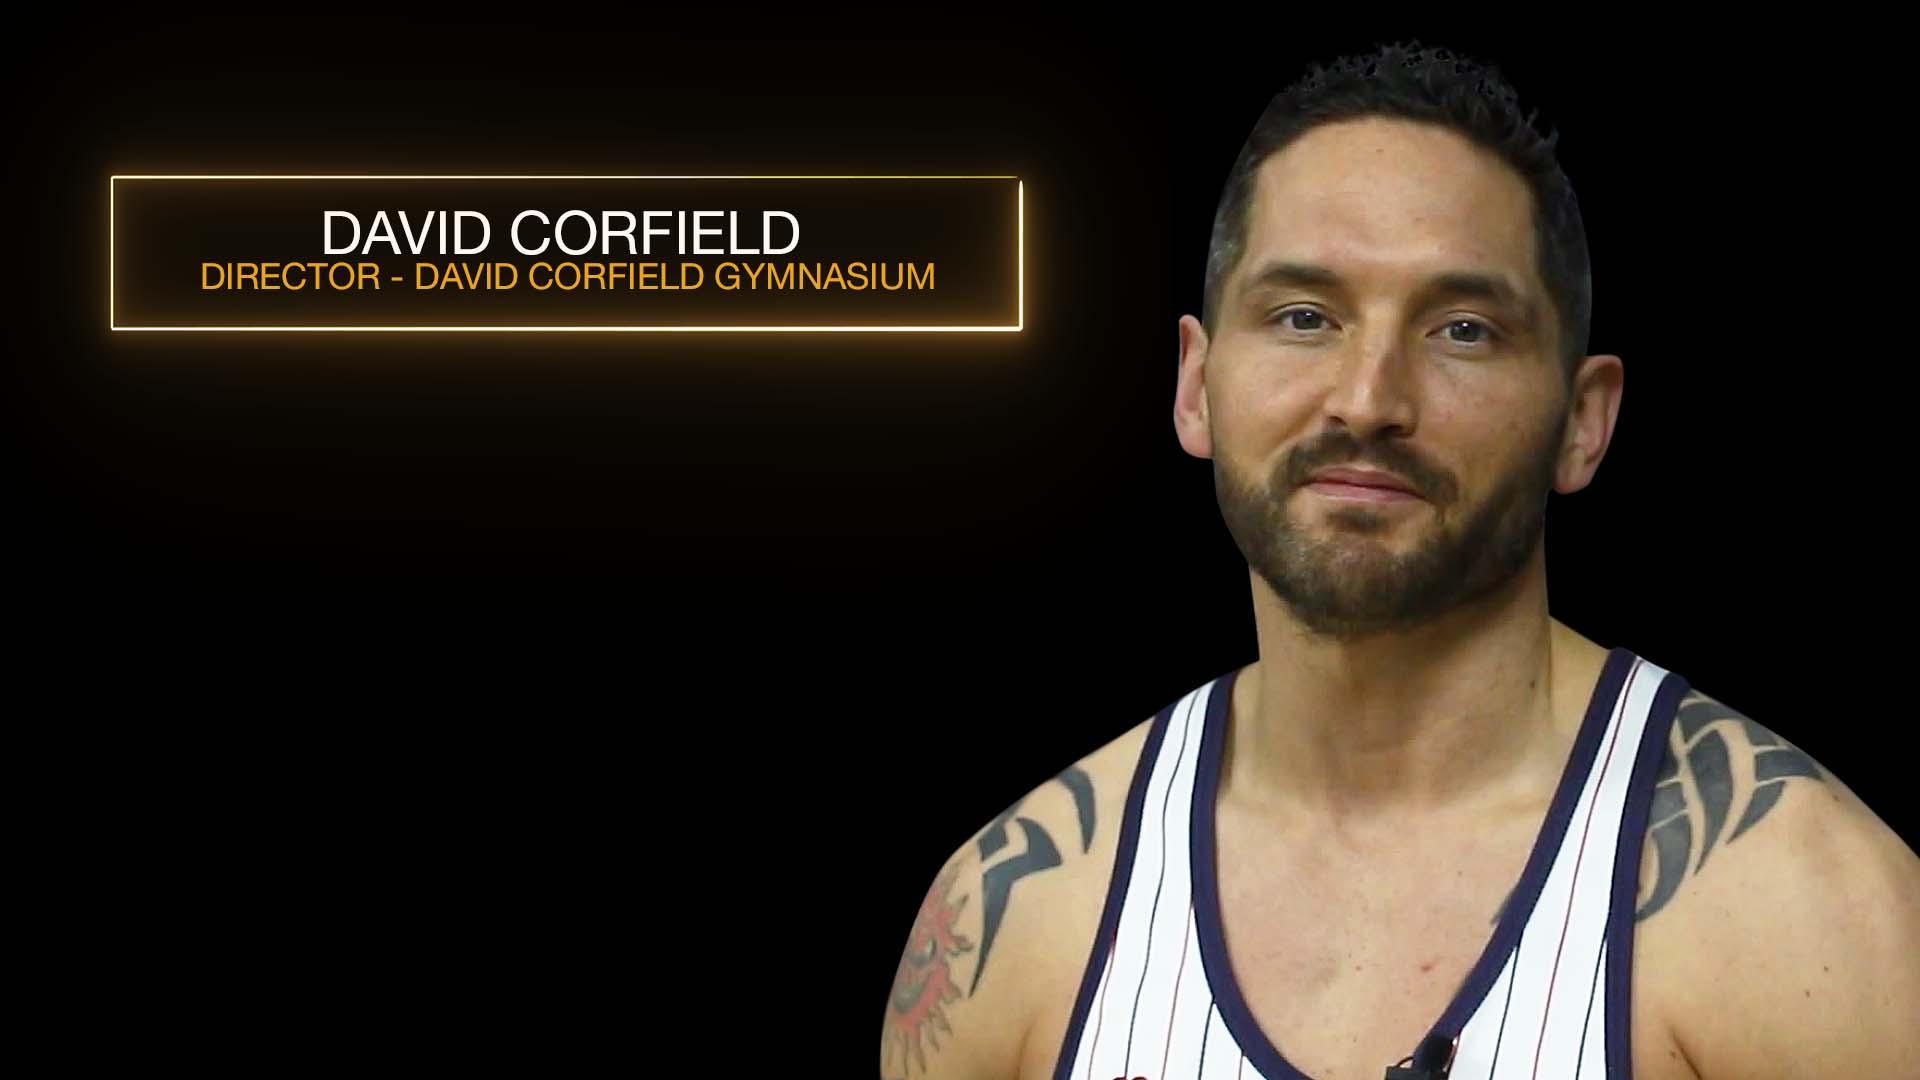 David Corfield Testimonial